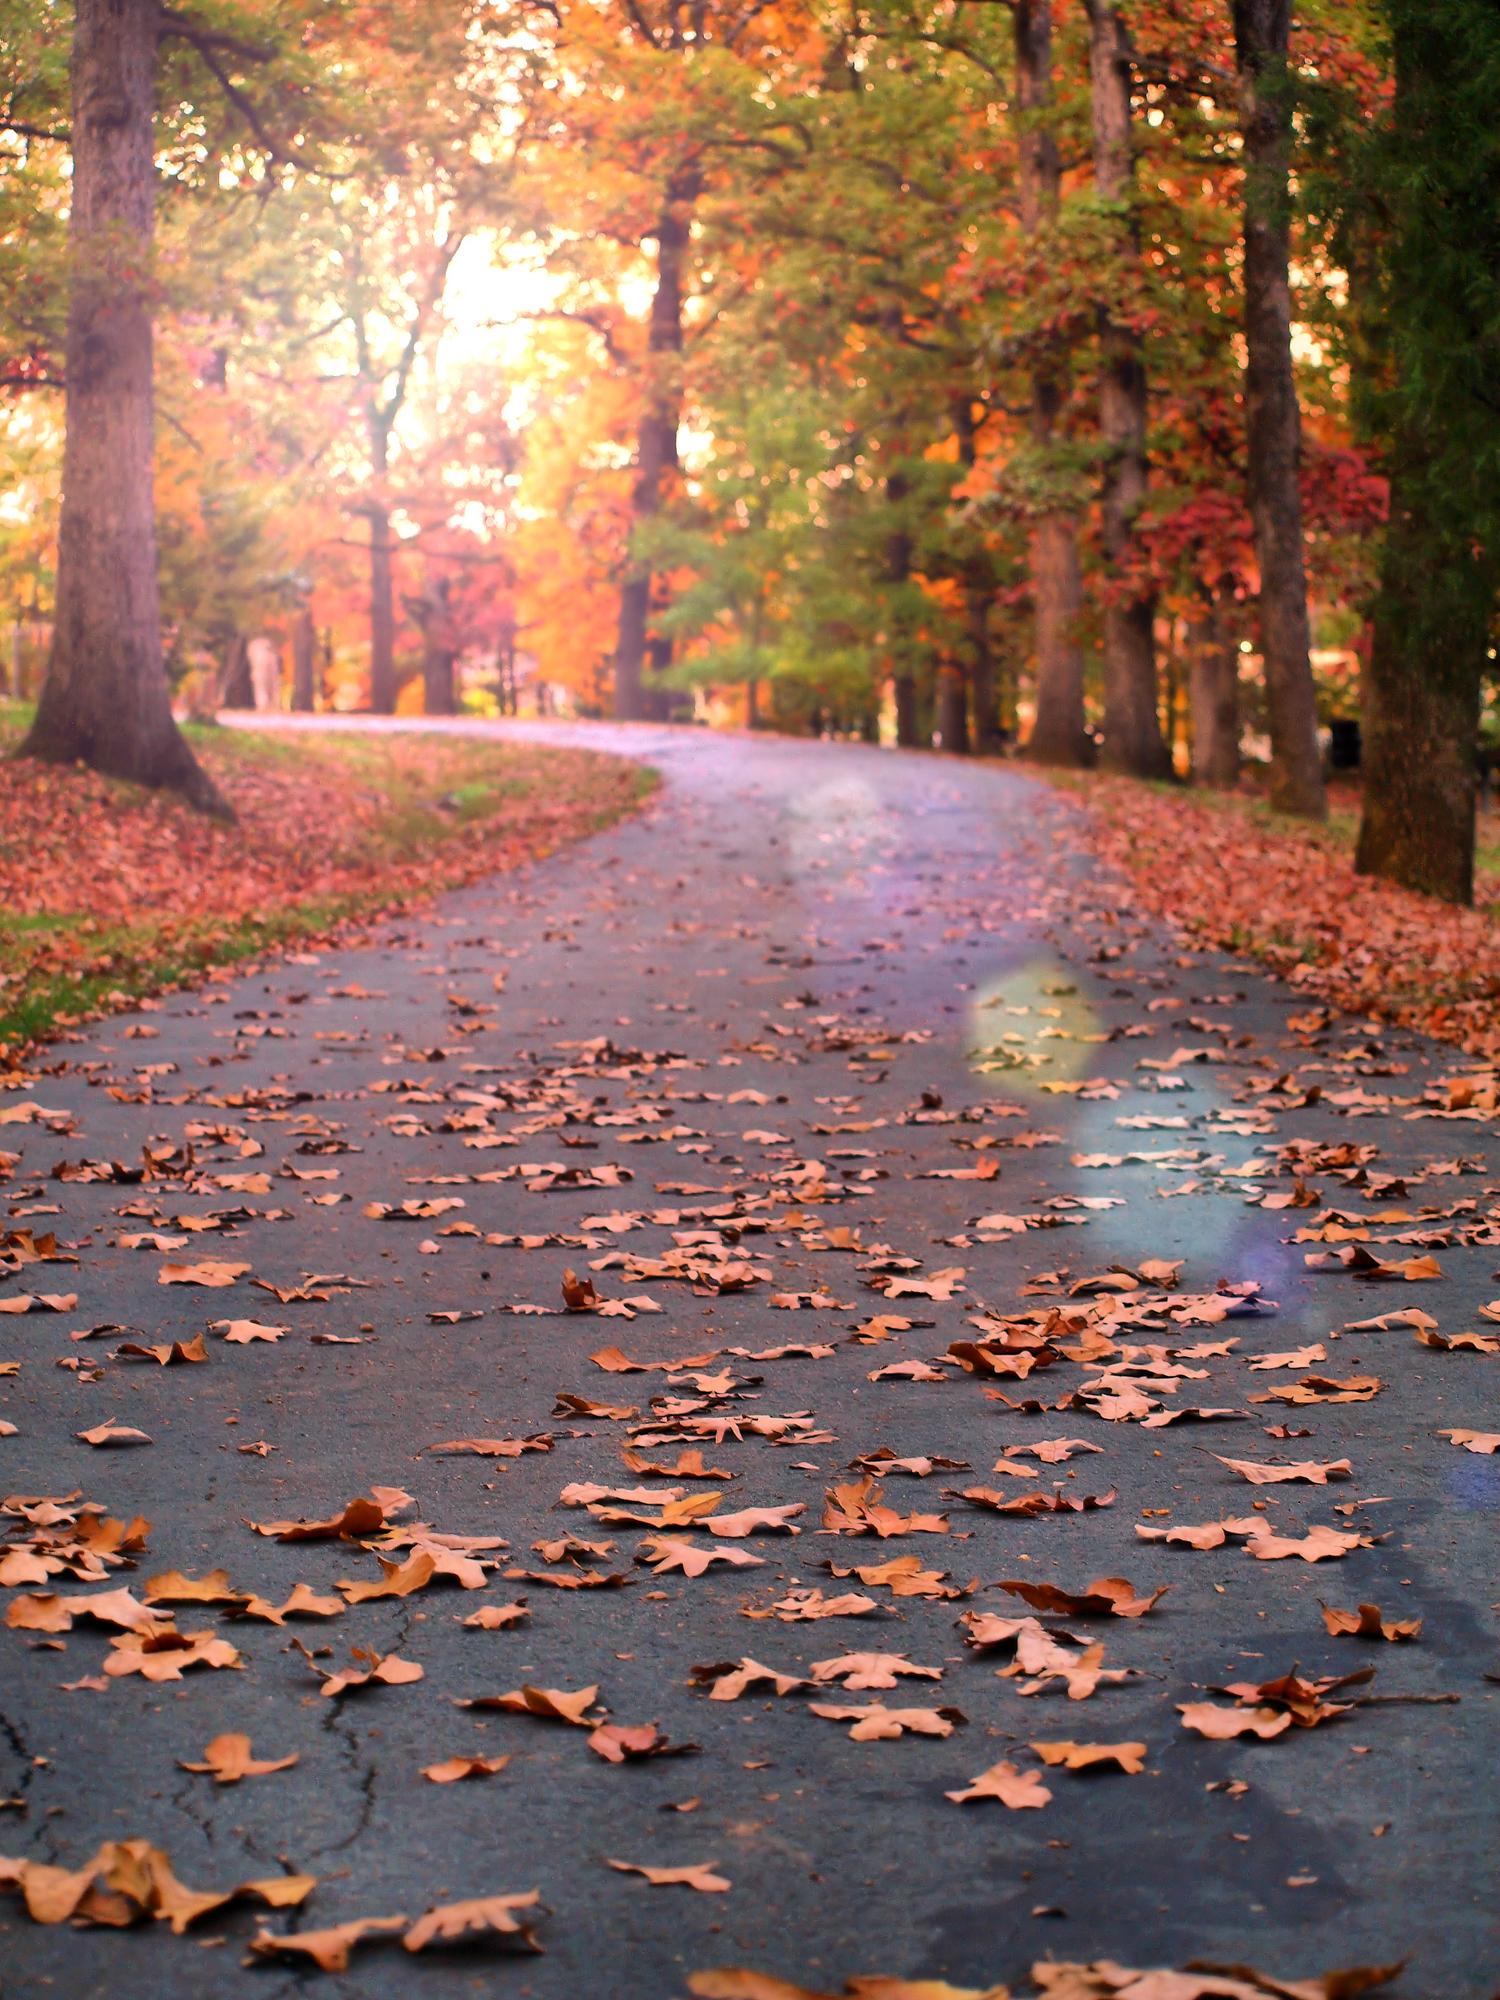 Autumn at Duke Park | Durham, North Carolina |© Christy Hydeck